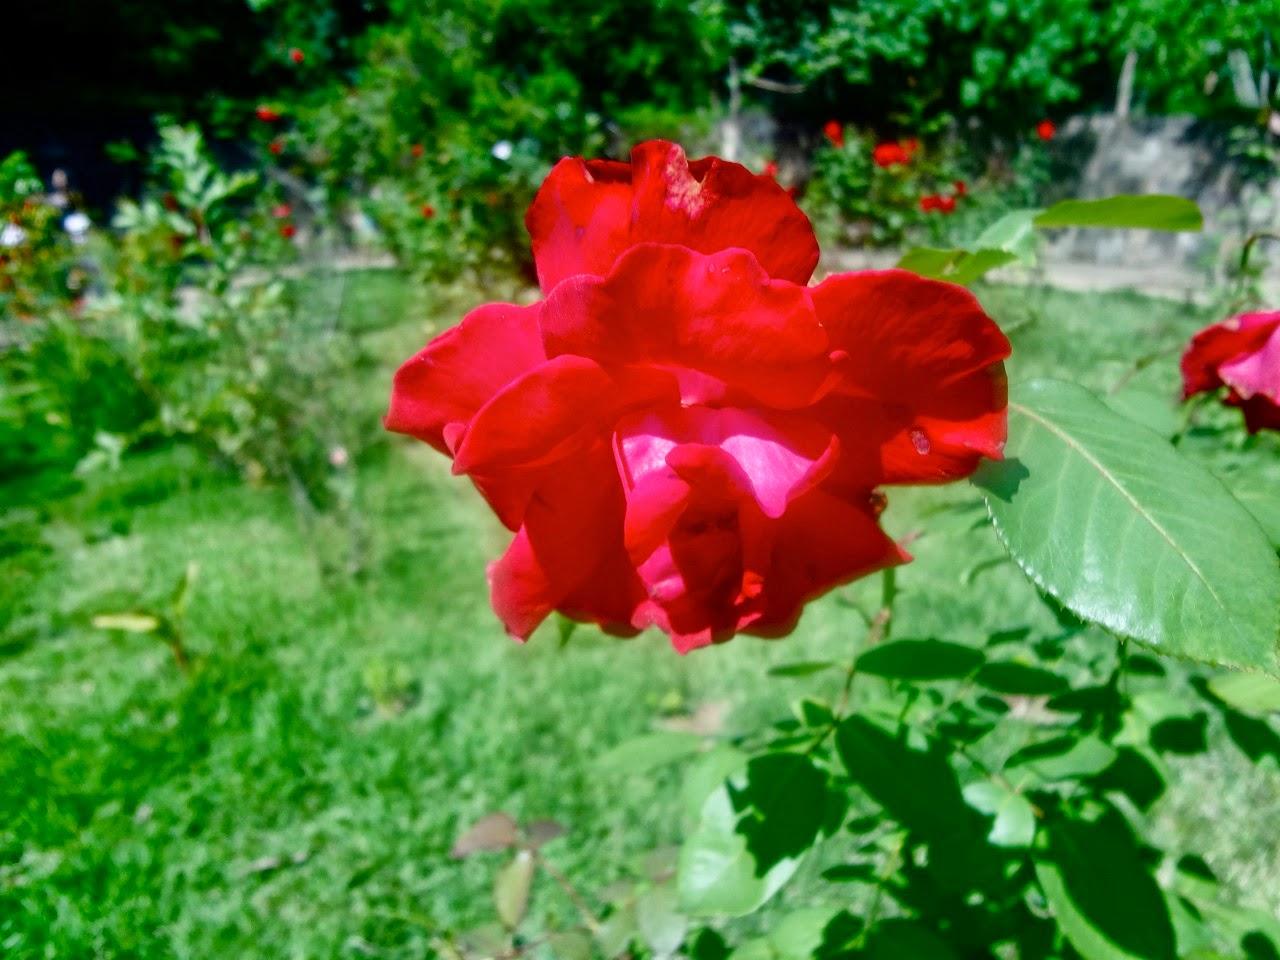 Parque Ecológico Chico Mendes flor